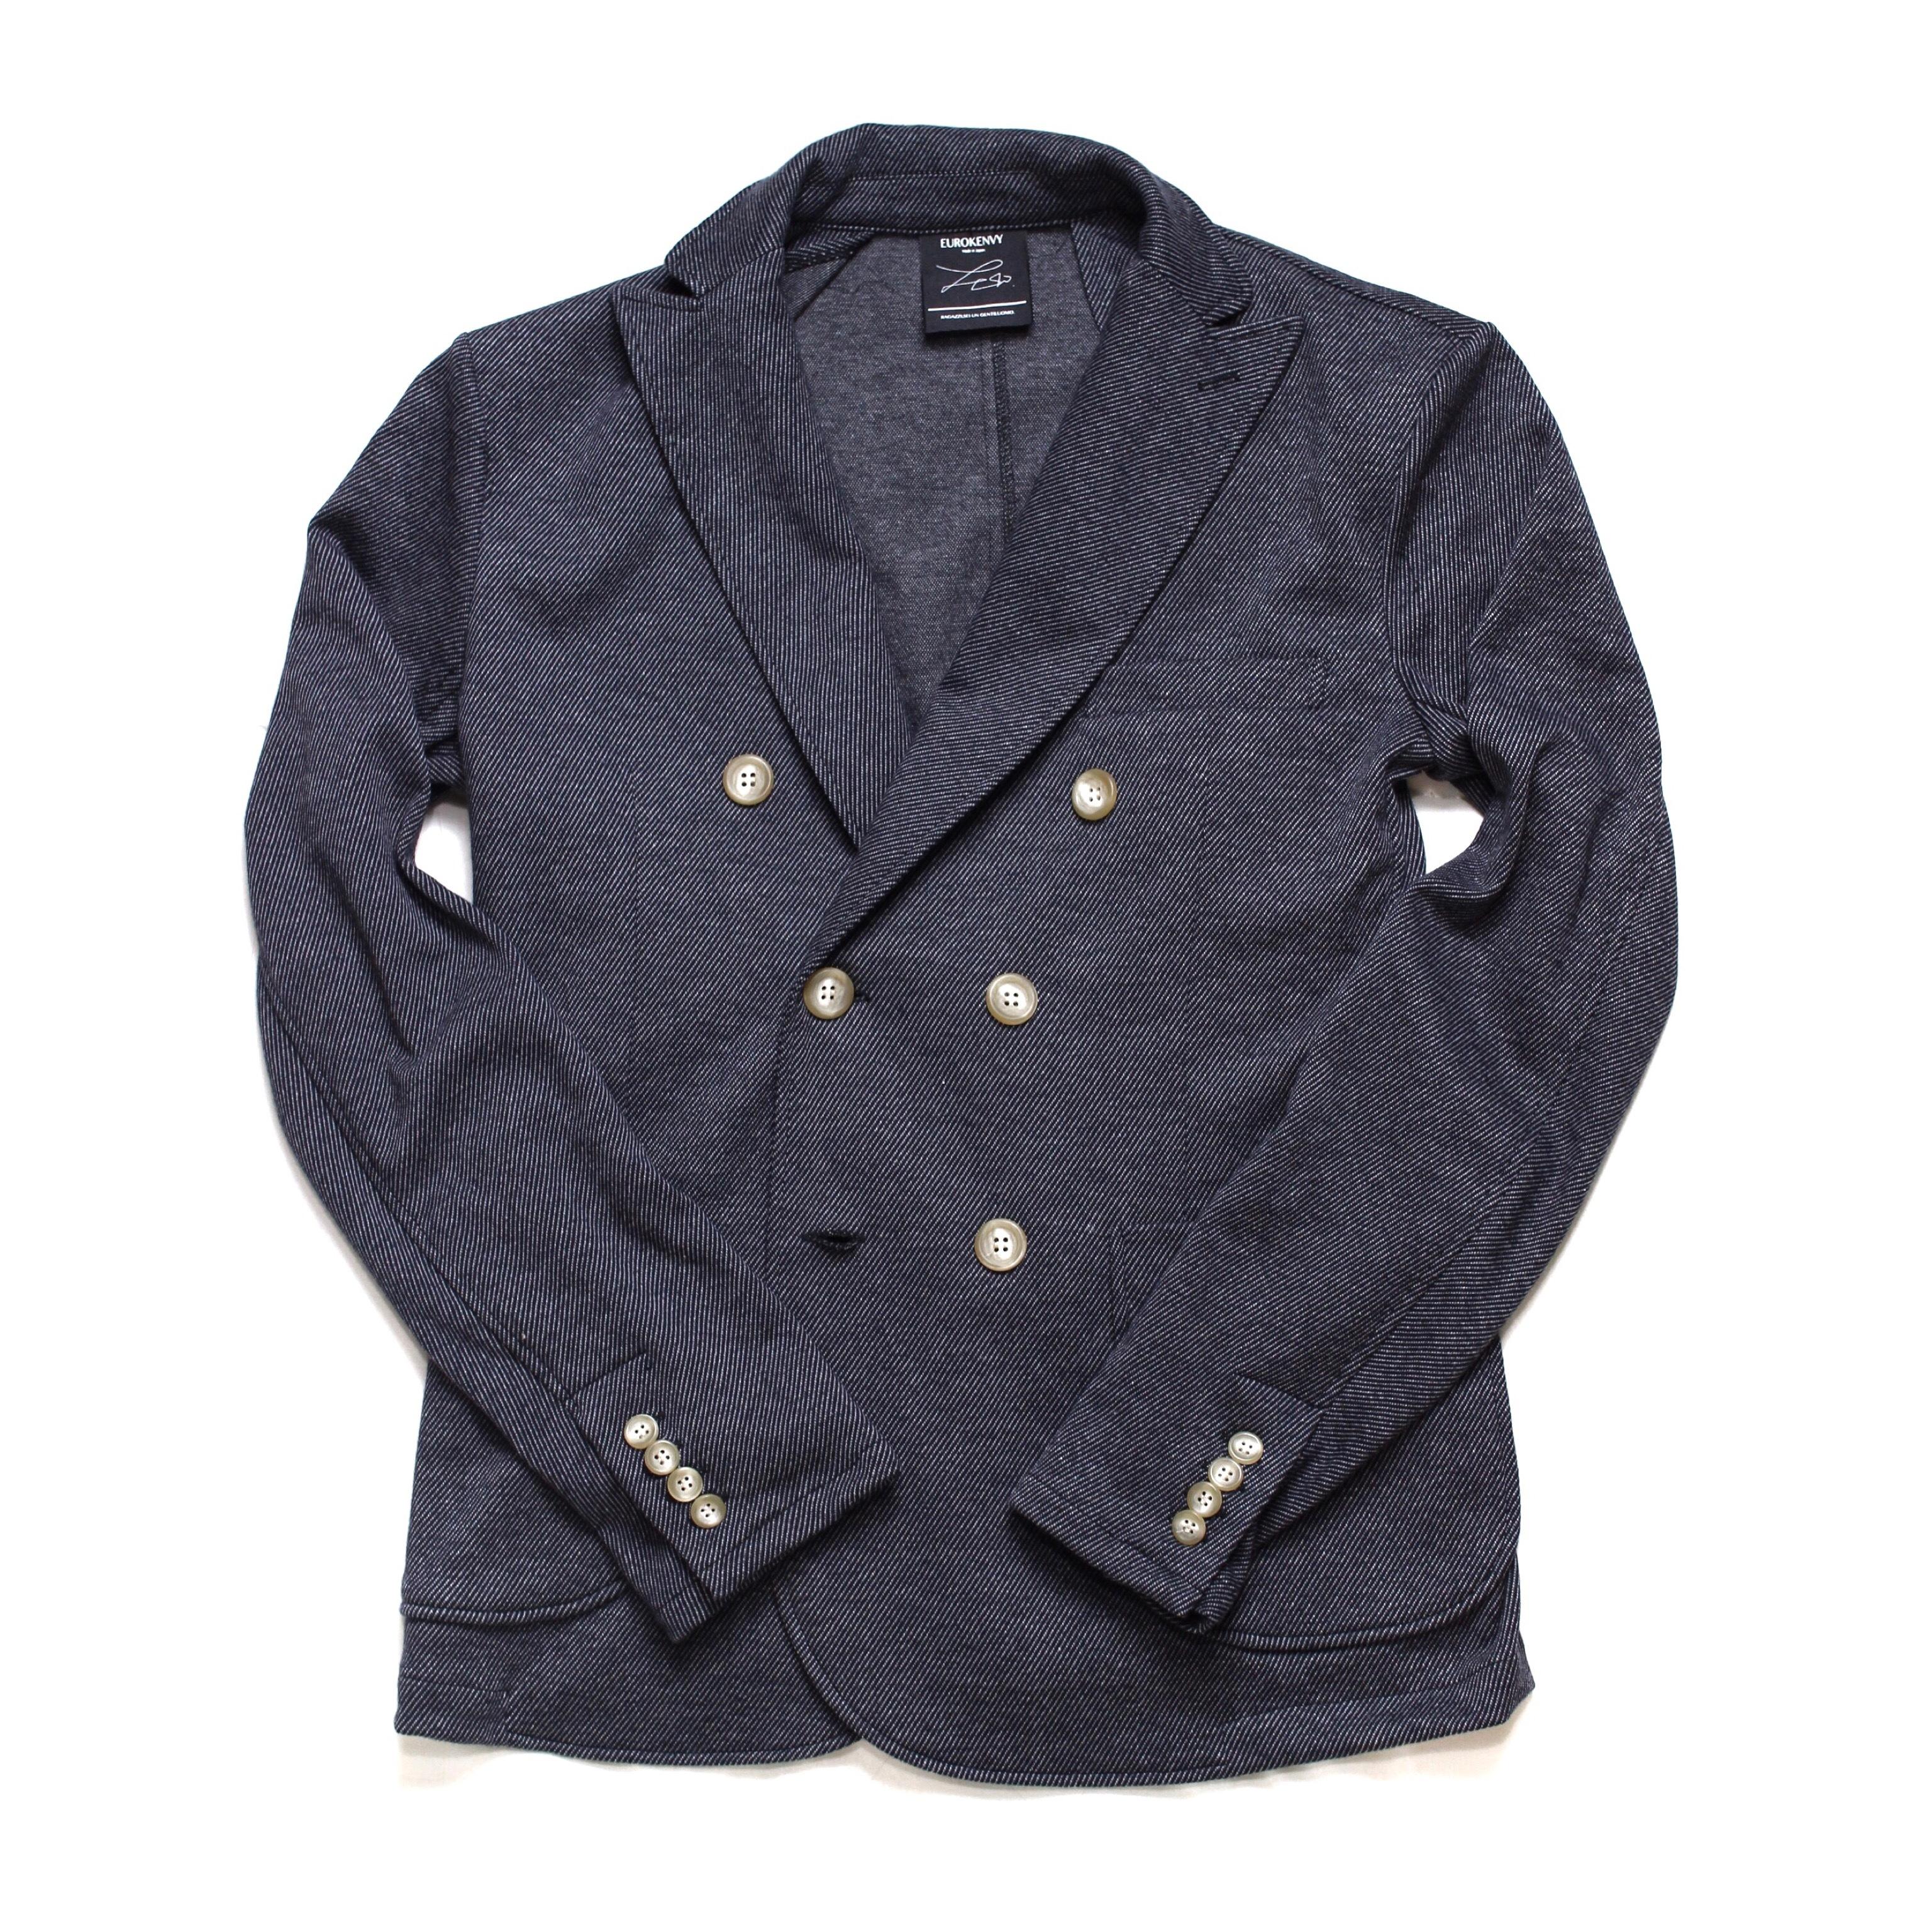 soft jersey double jacket GREY(ソフトジャージーダブルジャケット)